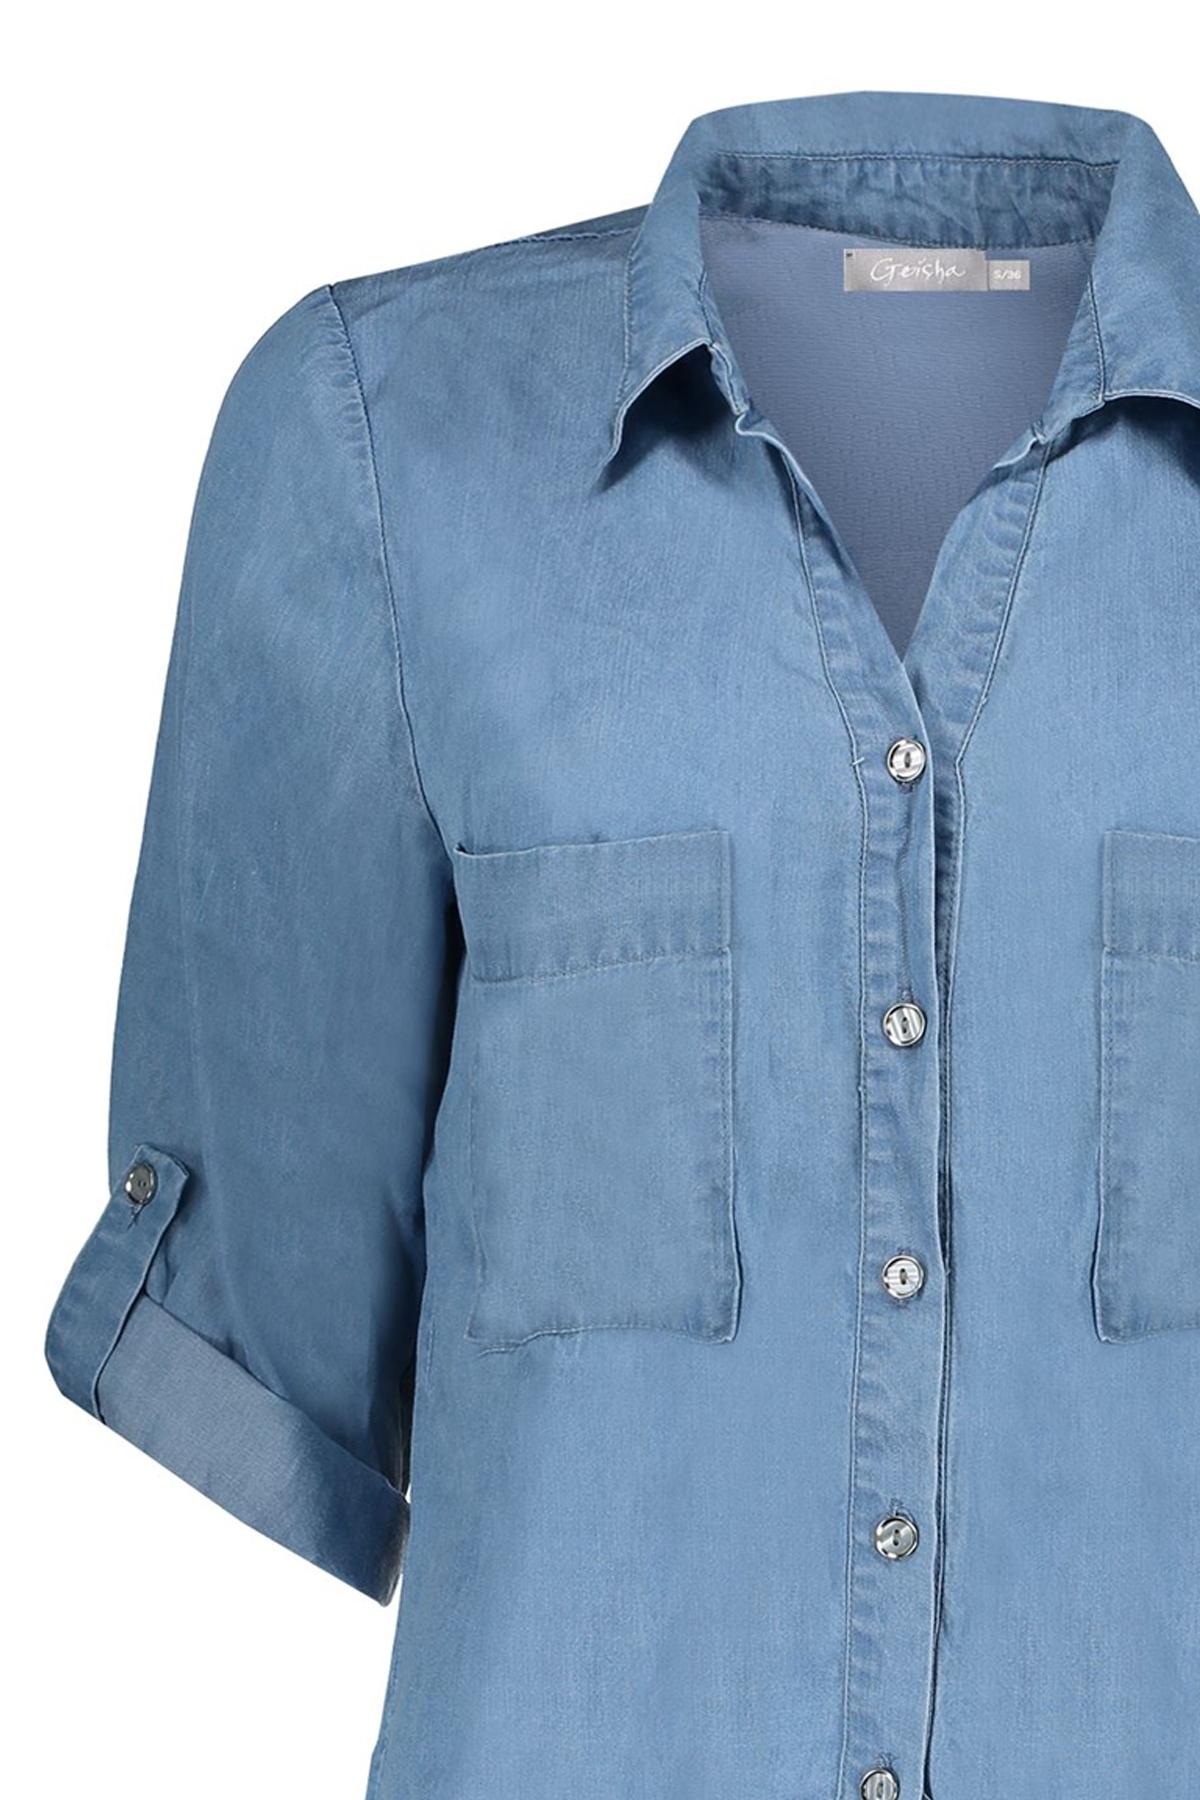 Geisha Shirt - Top Blauw 03171-70